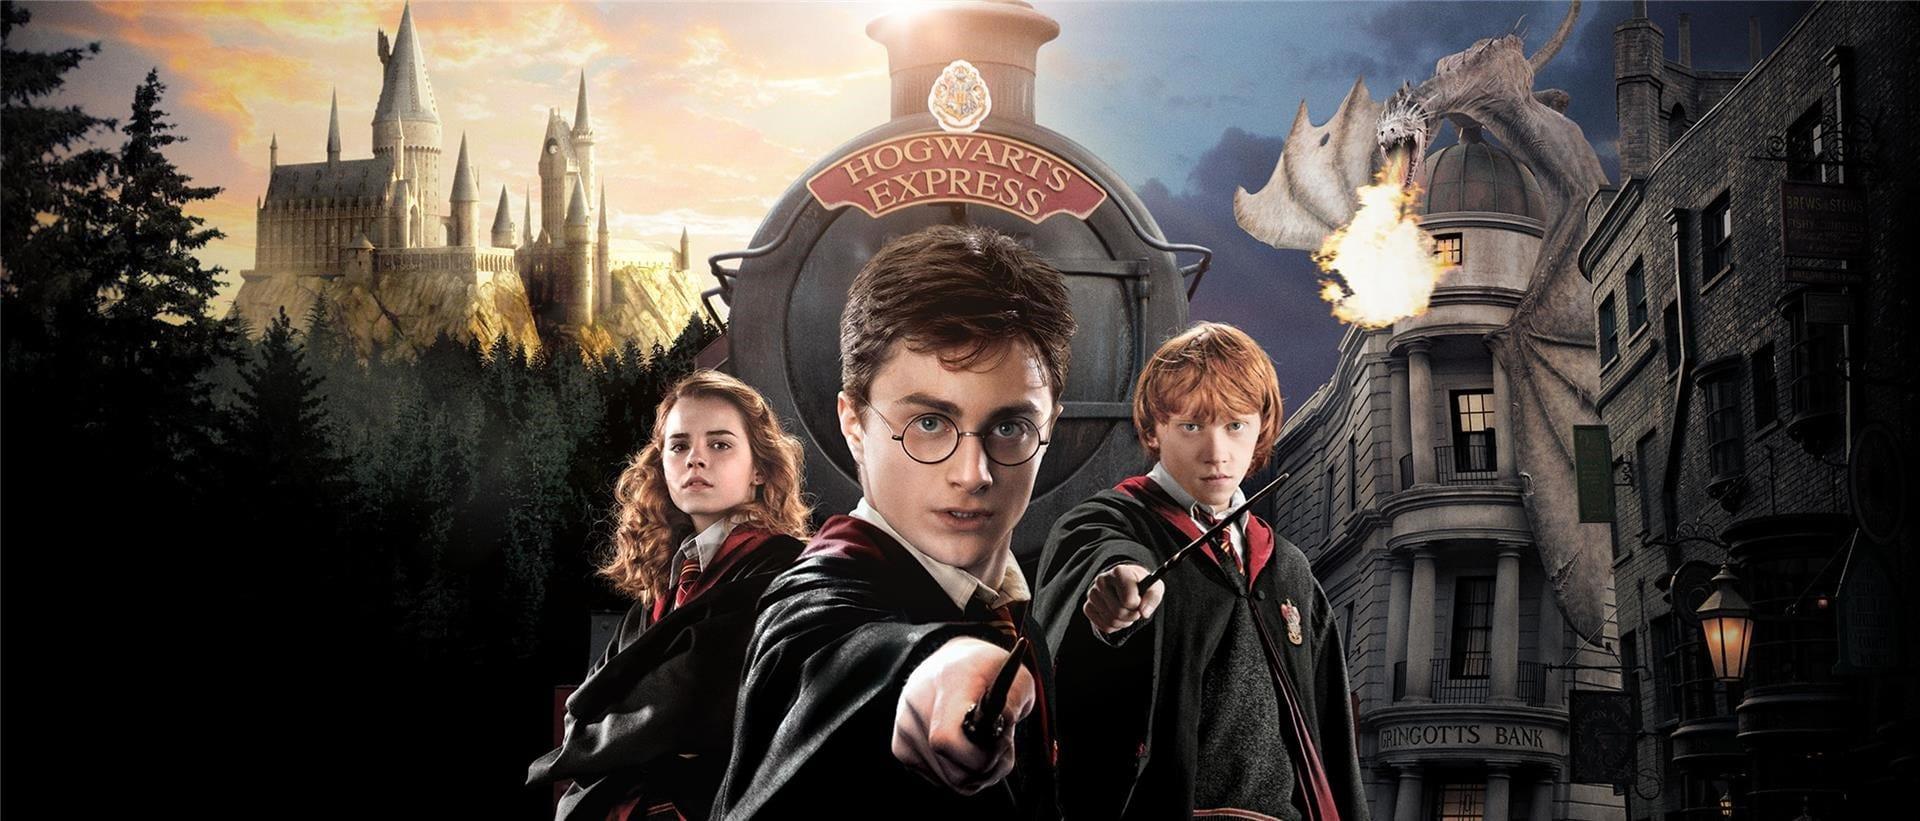 The Wizarding World of Harry Potter  Universal studios Florida